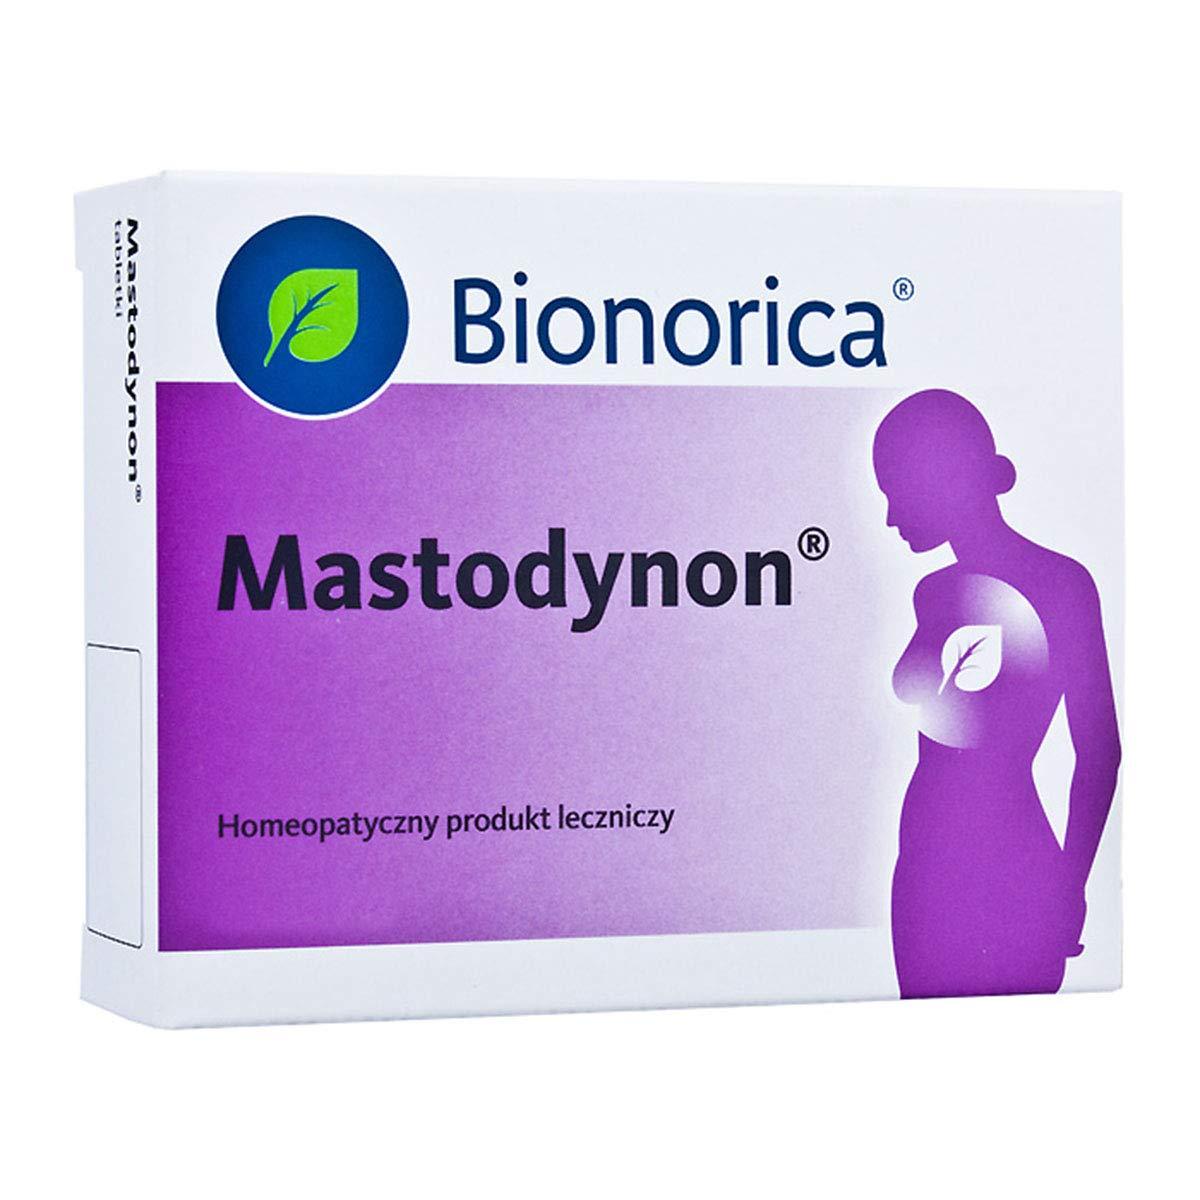 MASTODYNON 60 Tabs - Breast Pain, Mastitis, Menstrual Cycle Changes,PMS, Infertility